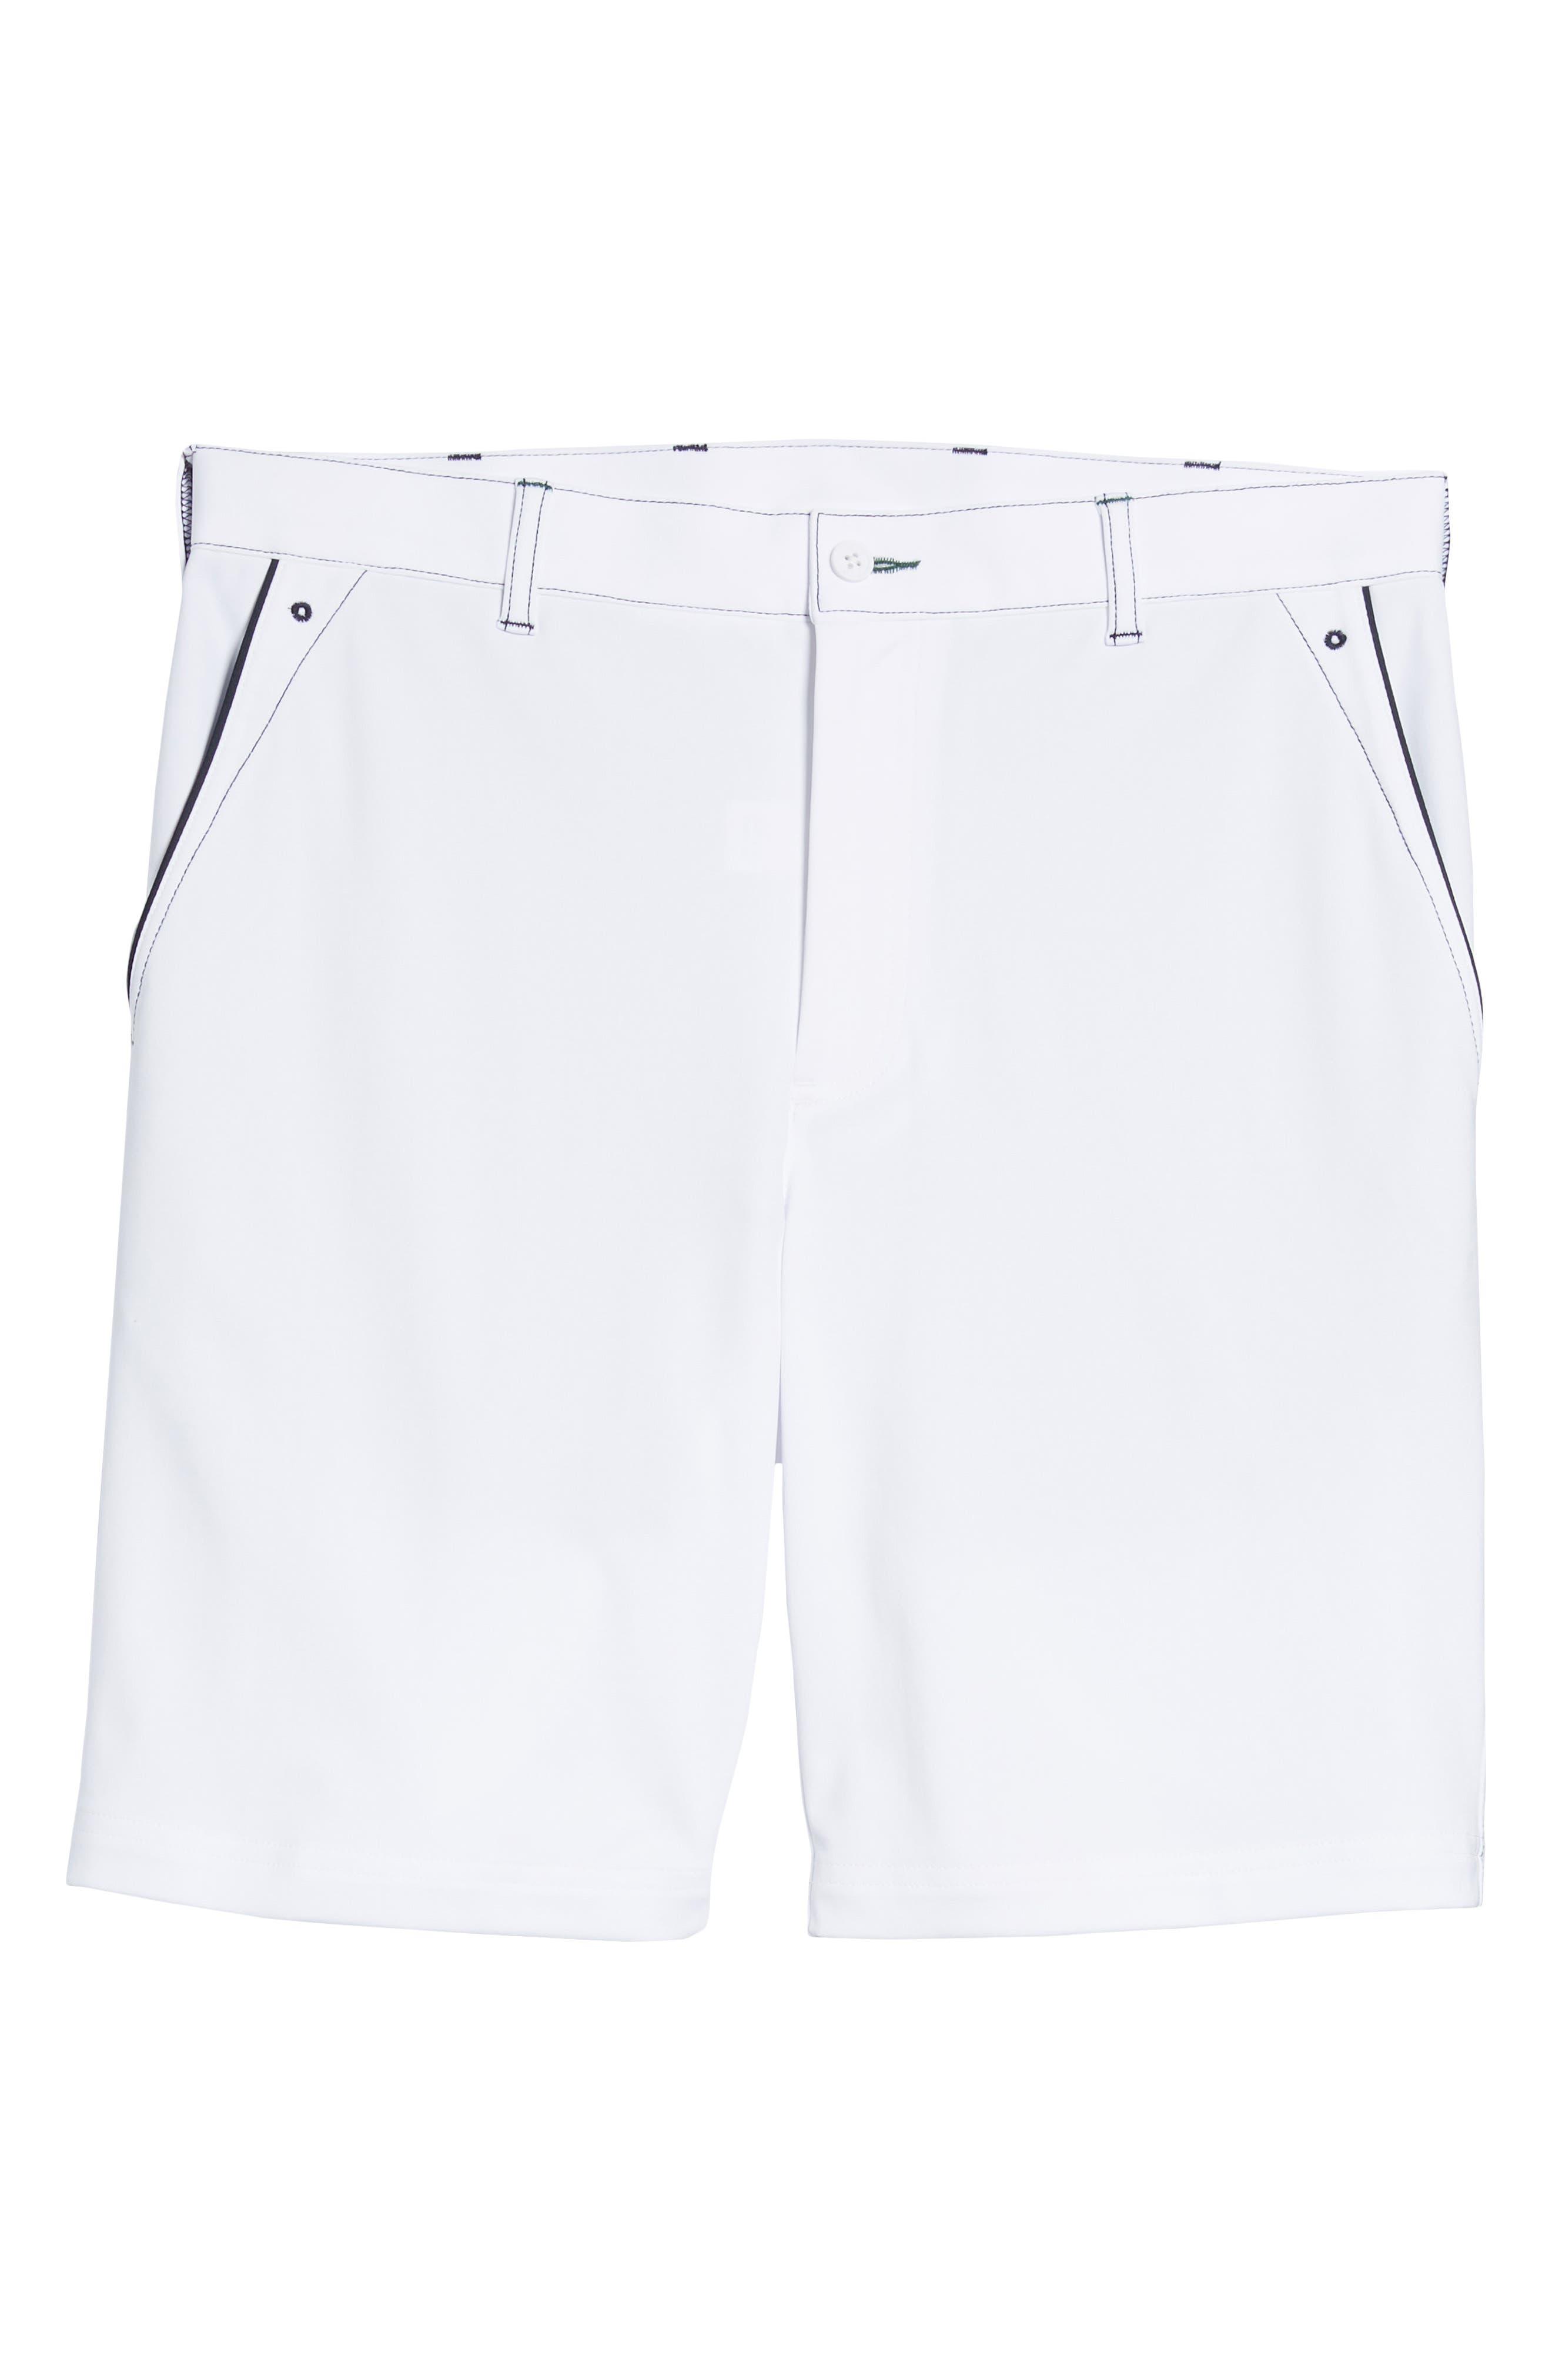 Trim Fit Tech Chino Shorts,                             Alternate thumbnail 6, color,                             White